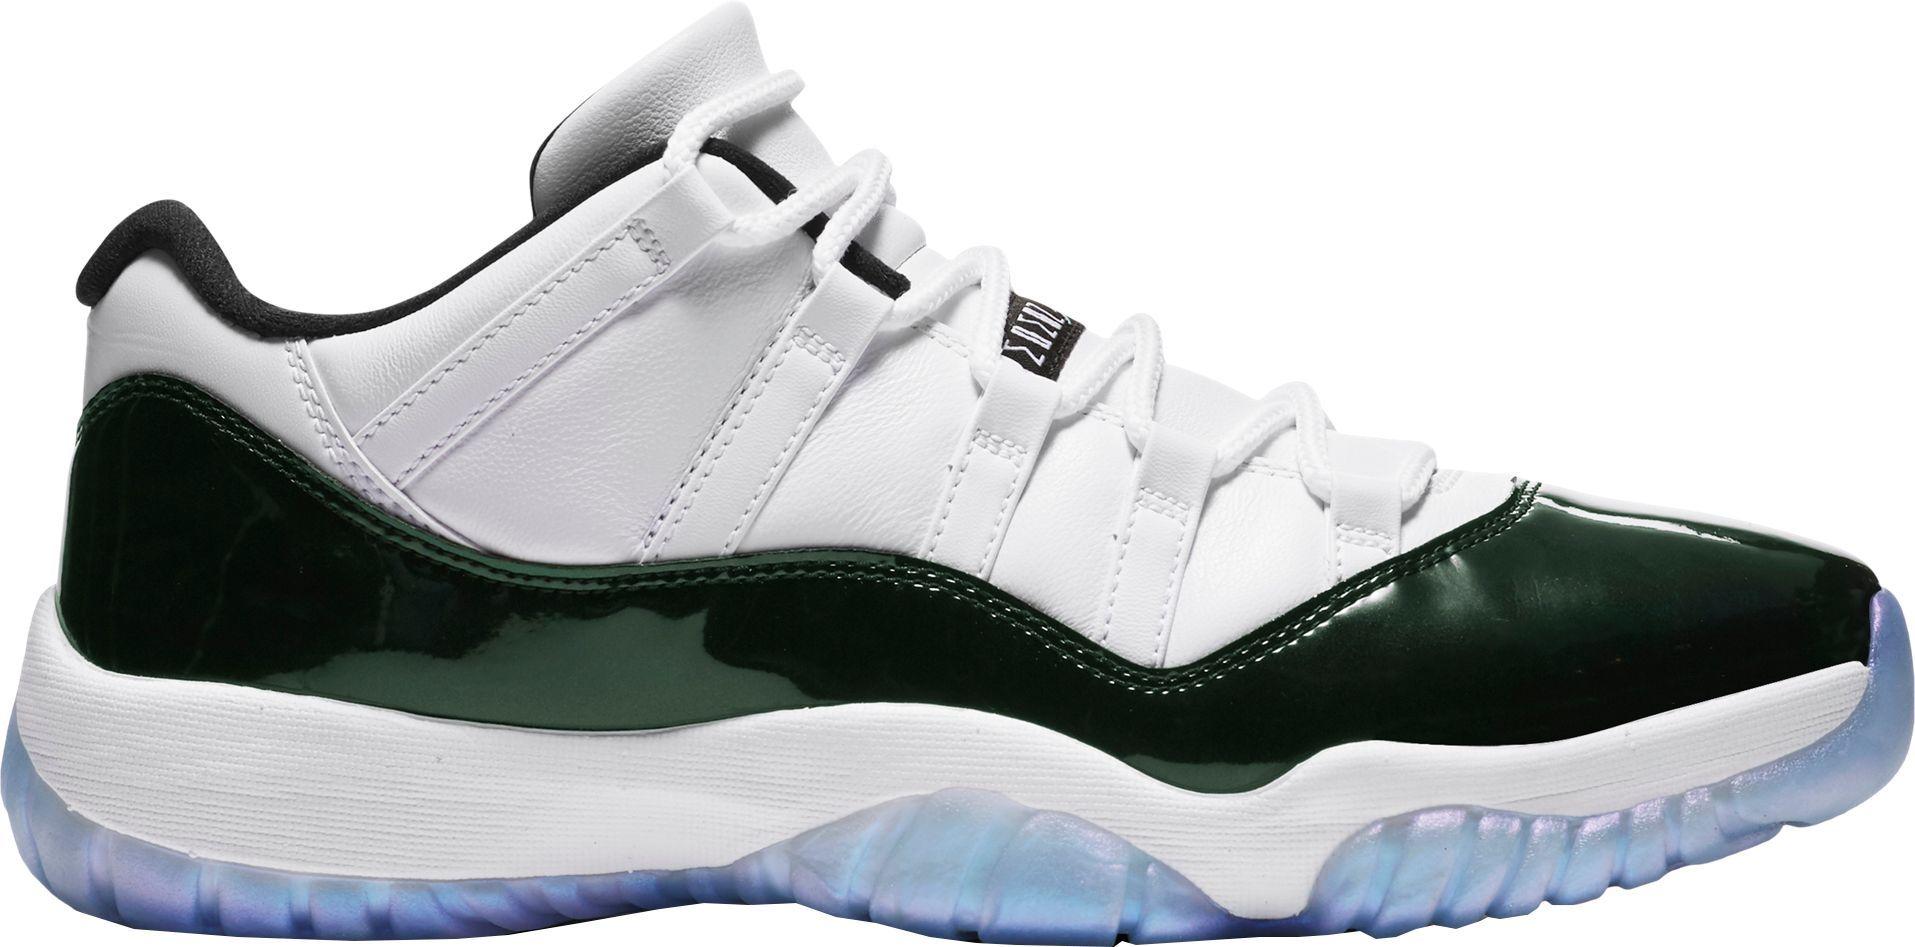 hot sales 91d25 aa4eb Jordan Men s Air Jordan 11 Retro Low Basketball Shoes, Size  18, White